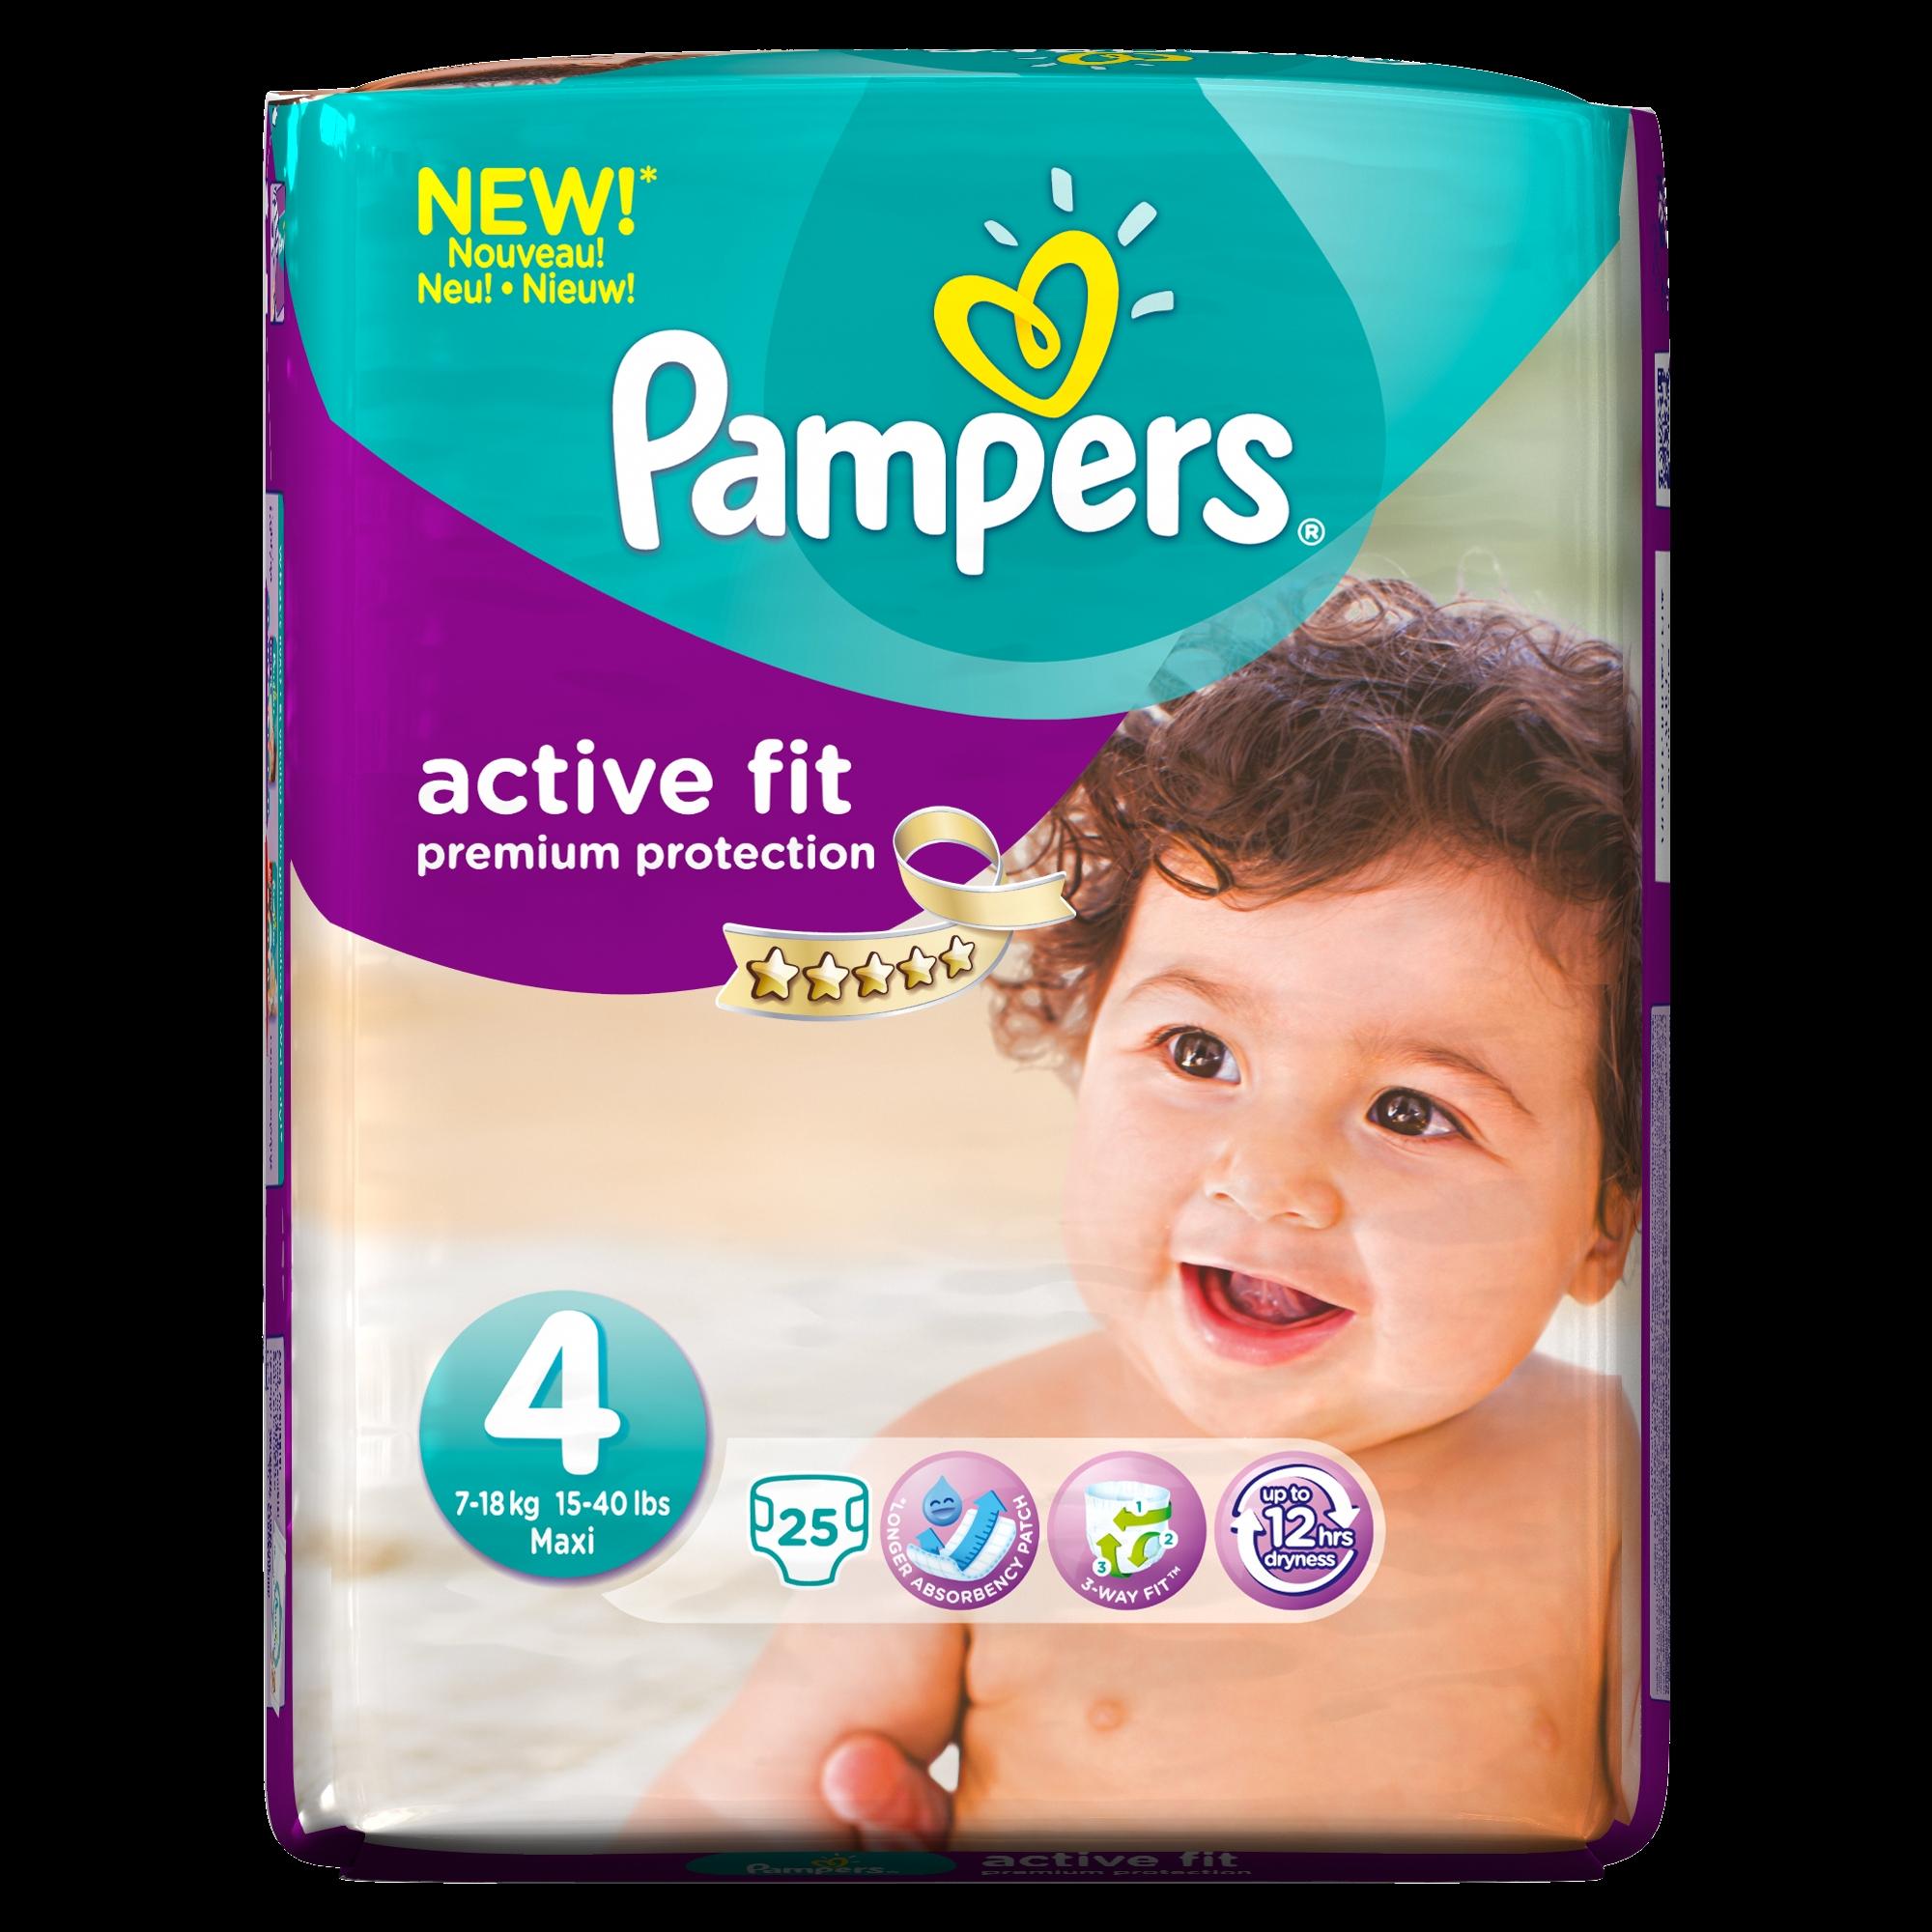 Pampers Unveils New Premium Protection Nappy Range